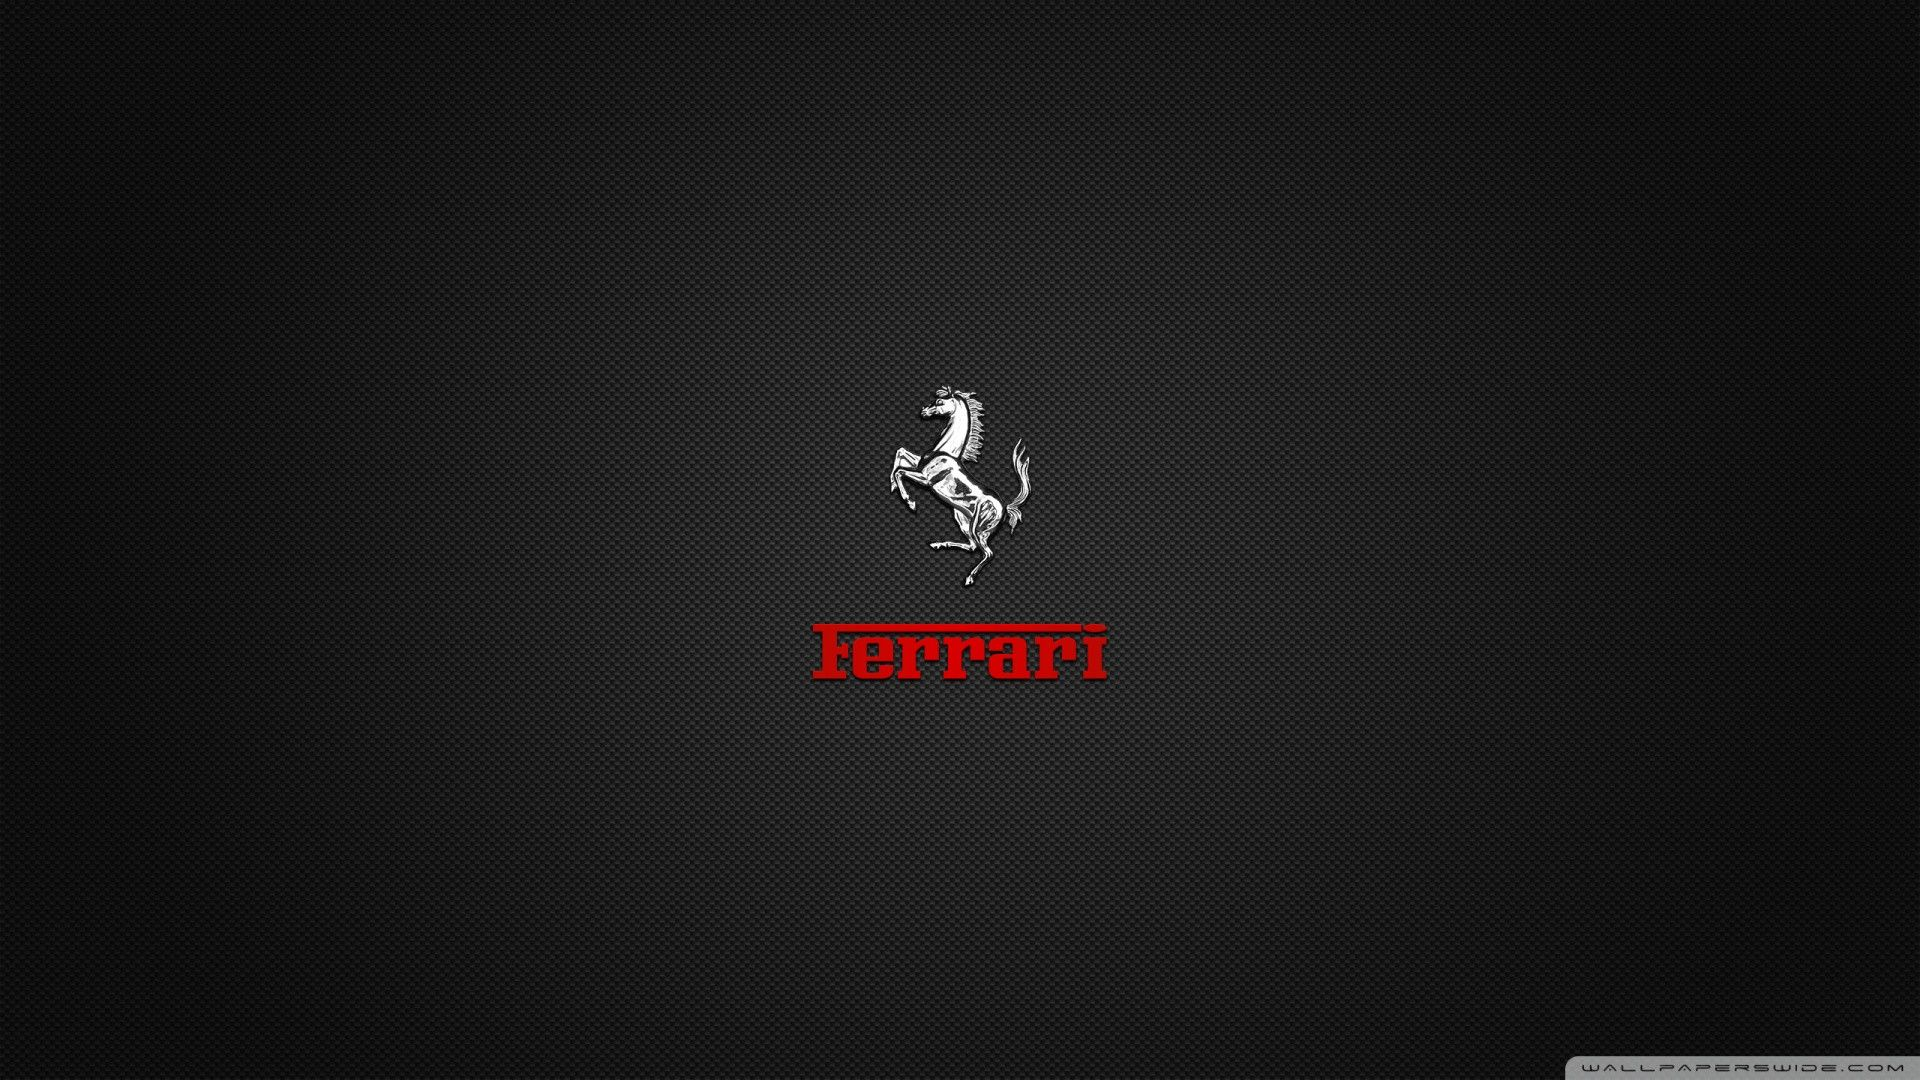 ferrari logo wallpaper 678 - Ferrari Logo Wallpaper